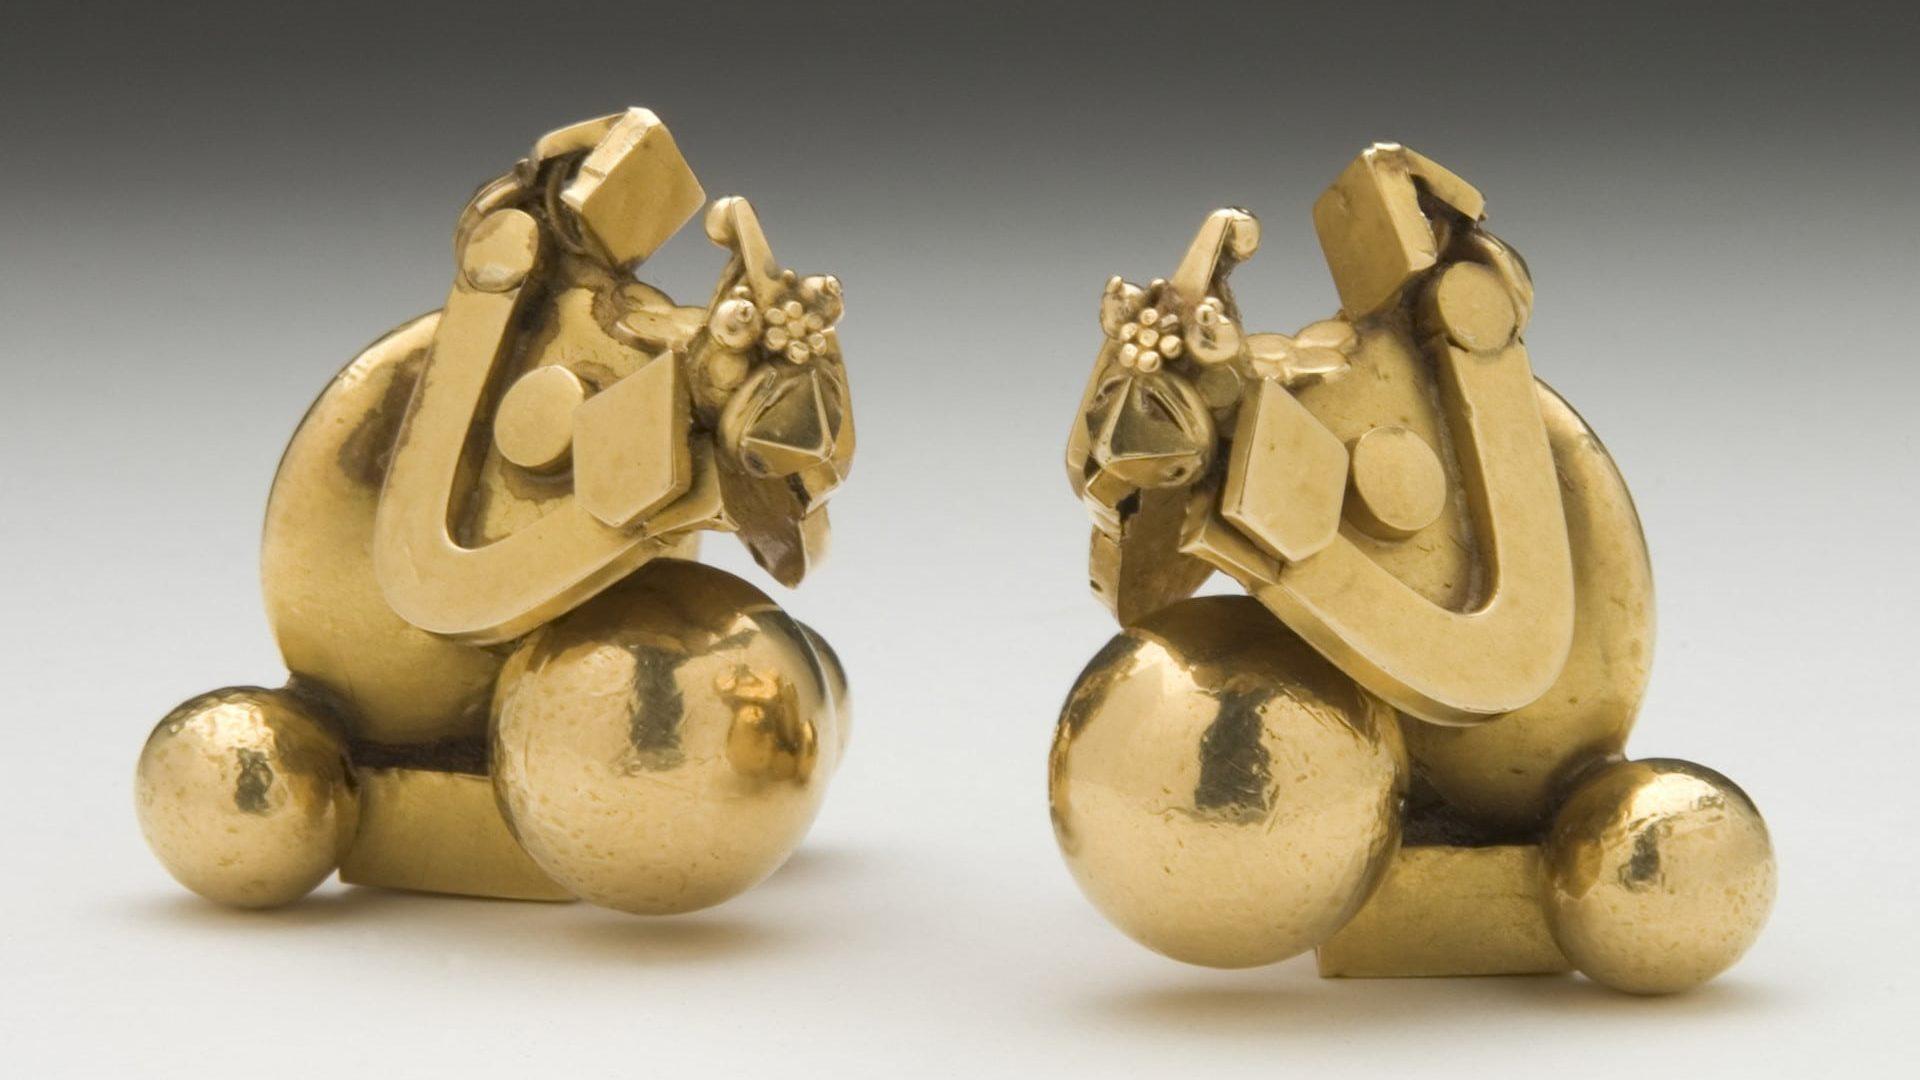 Pampadam earrings